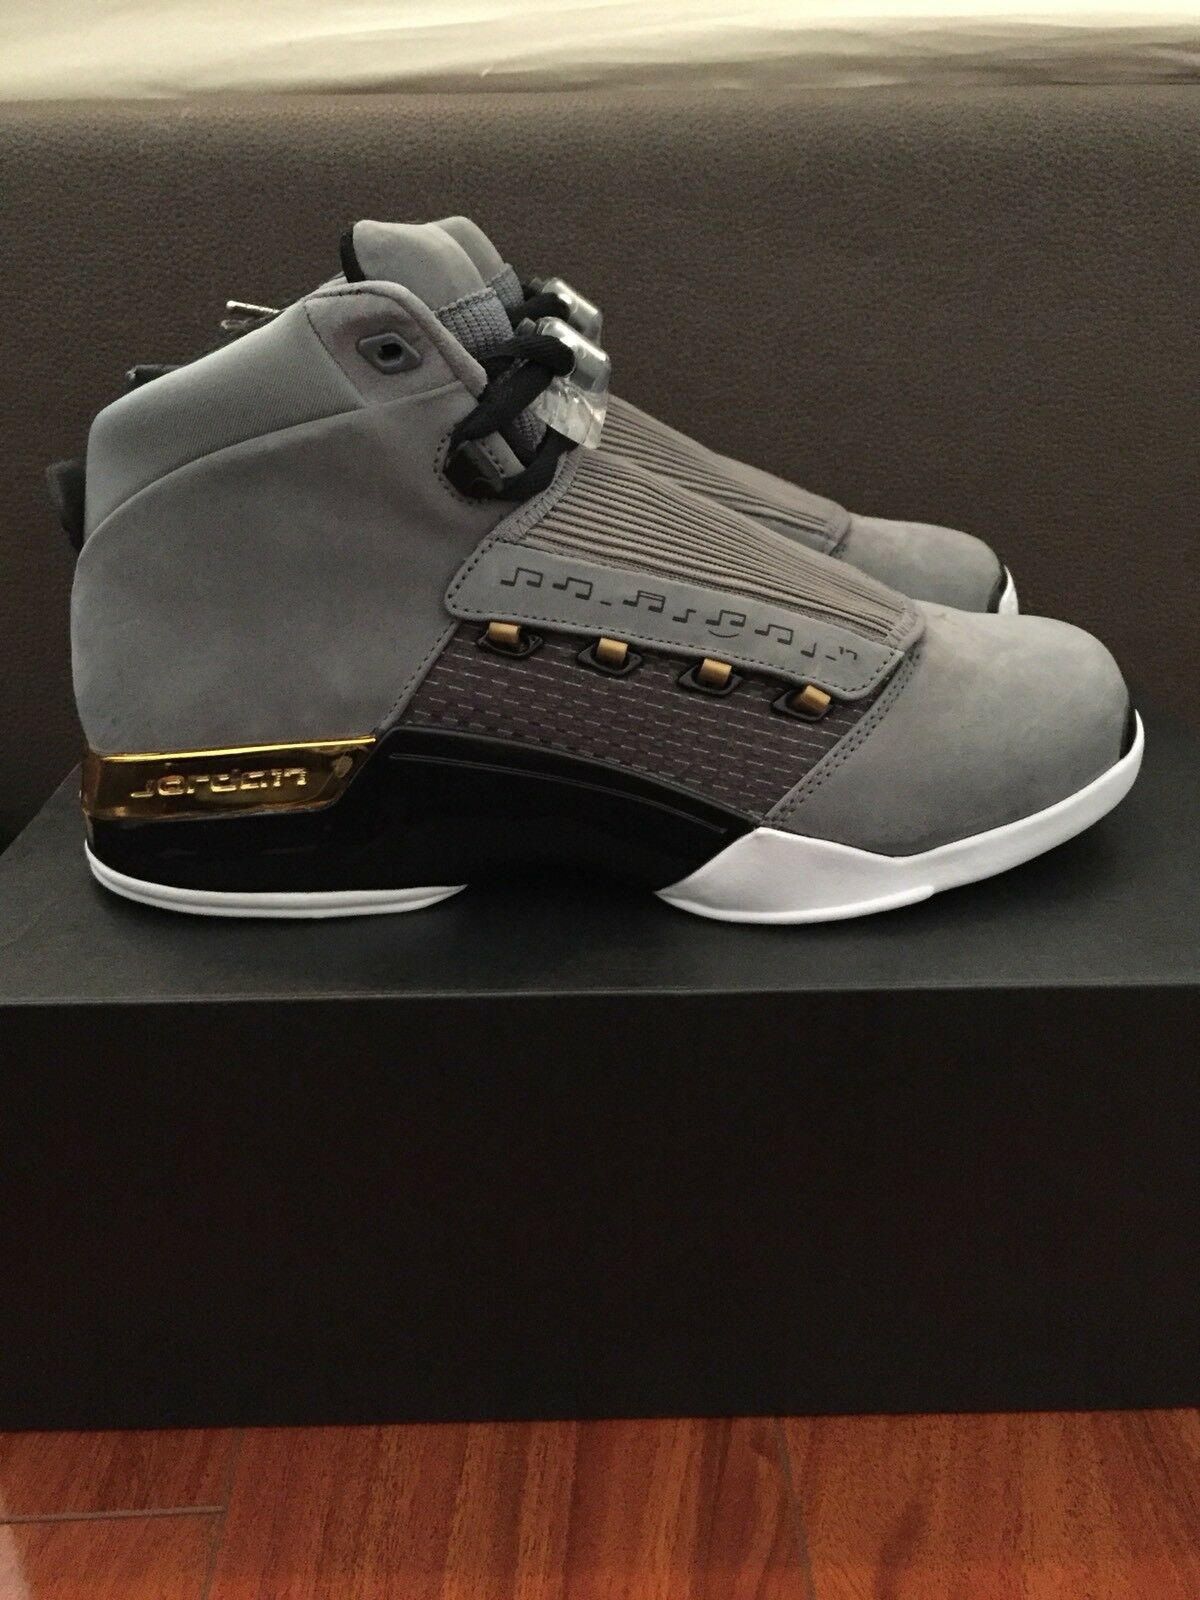 Nike Air Jordan 17 Trophy Room Grey Metallic J17 AH7963 023 Sz 8.5